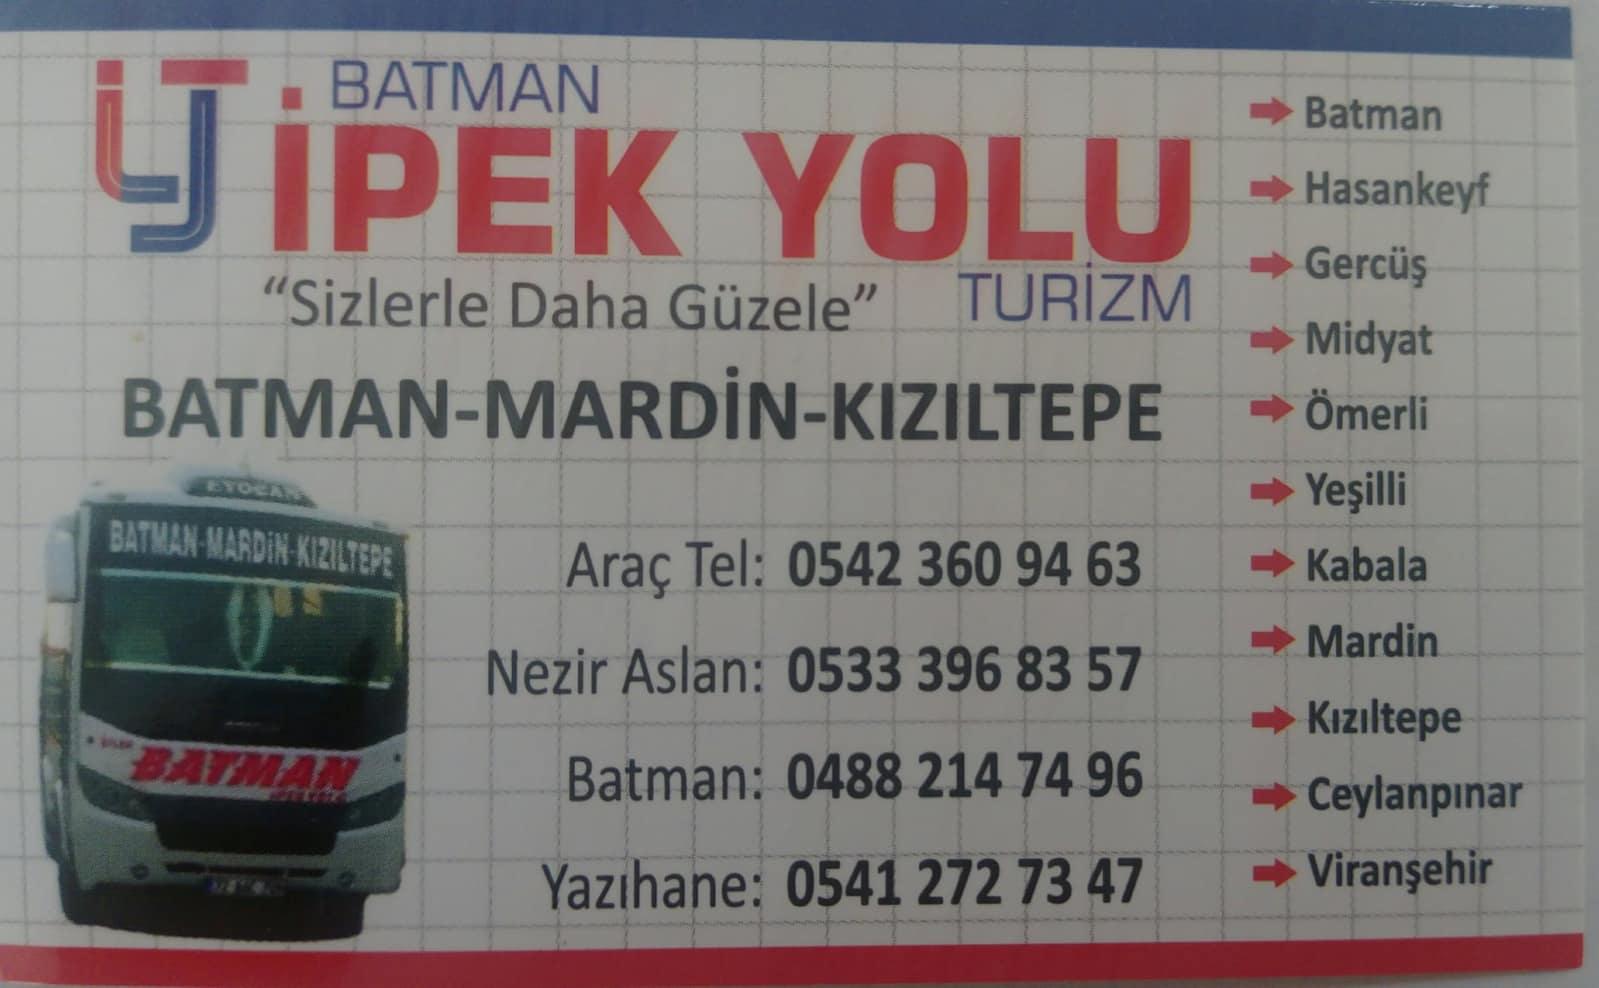 Batman İpek Yolu Turizm